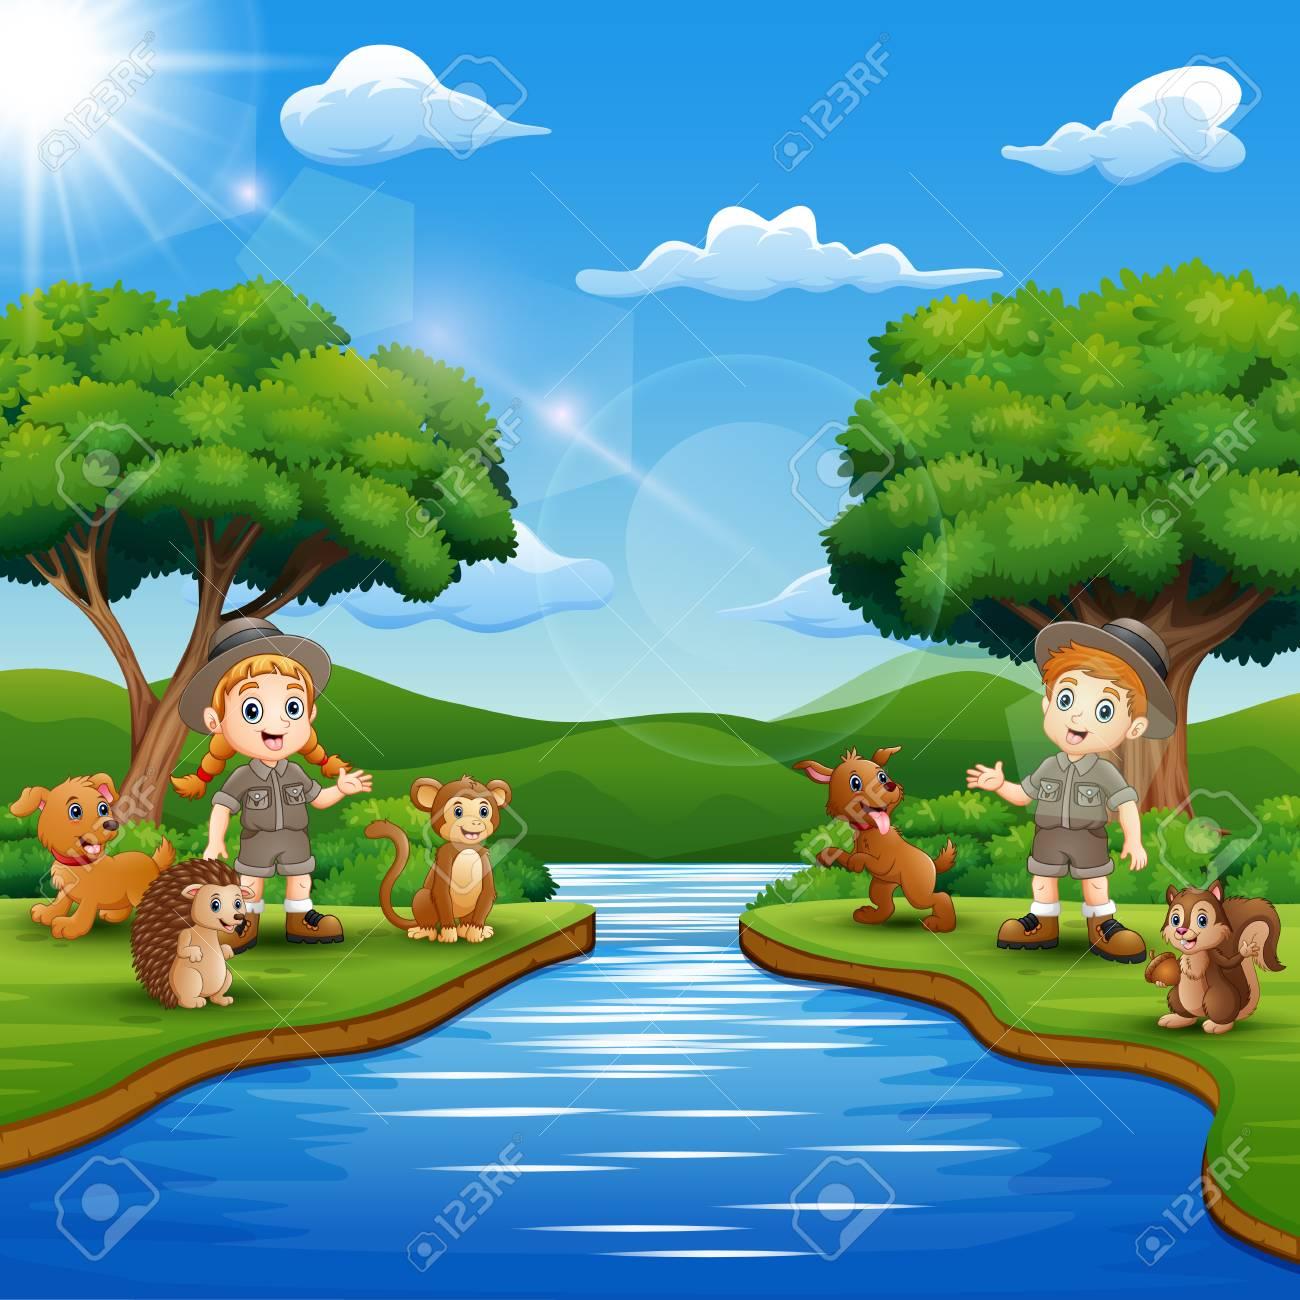 Wild animals living next to river - Download Free Vectors, Clipart Graphics  & Vector Art